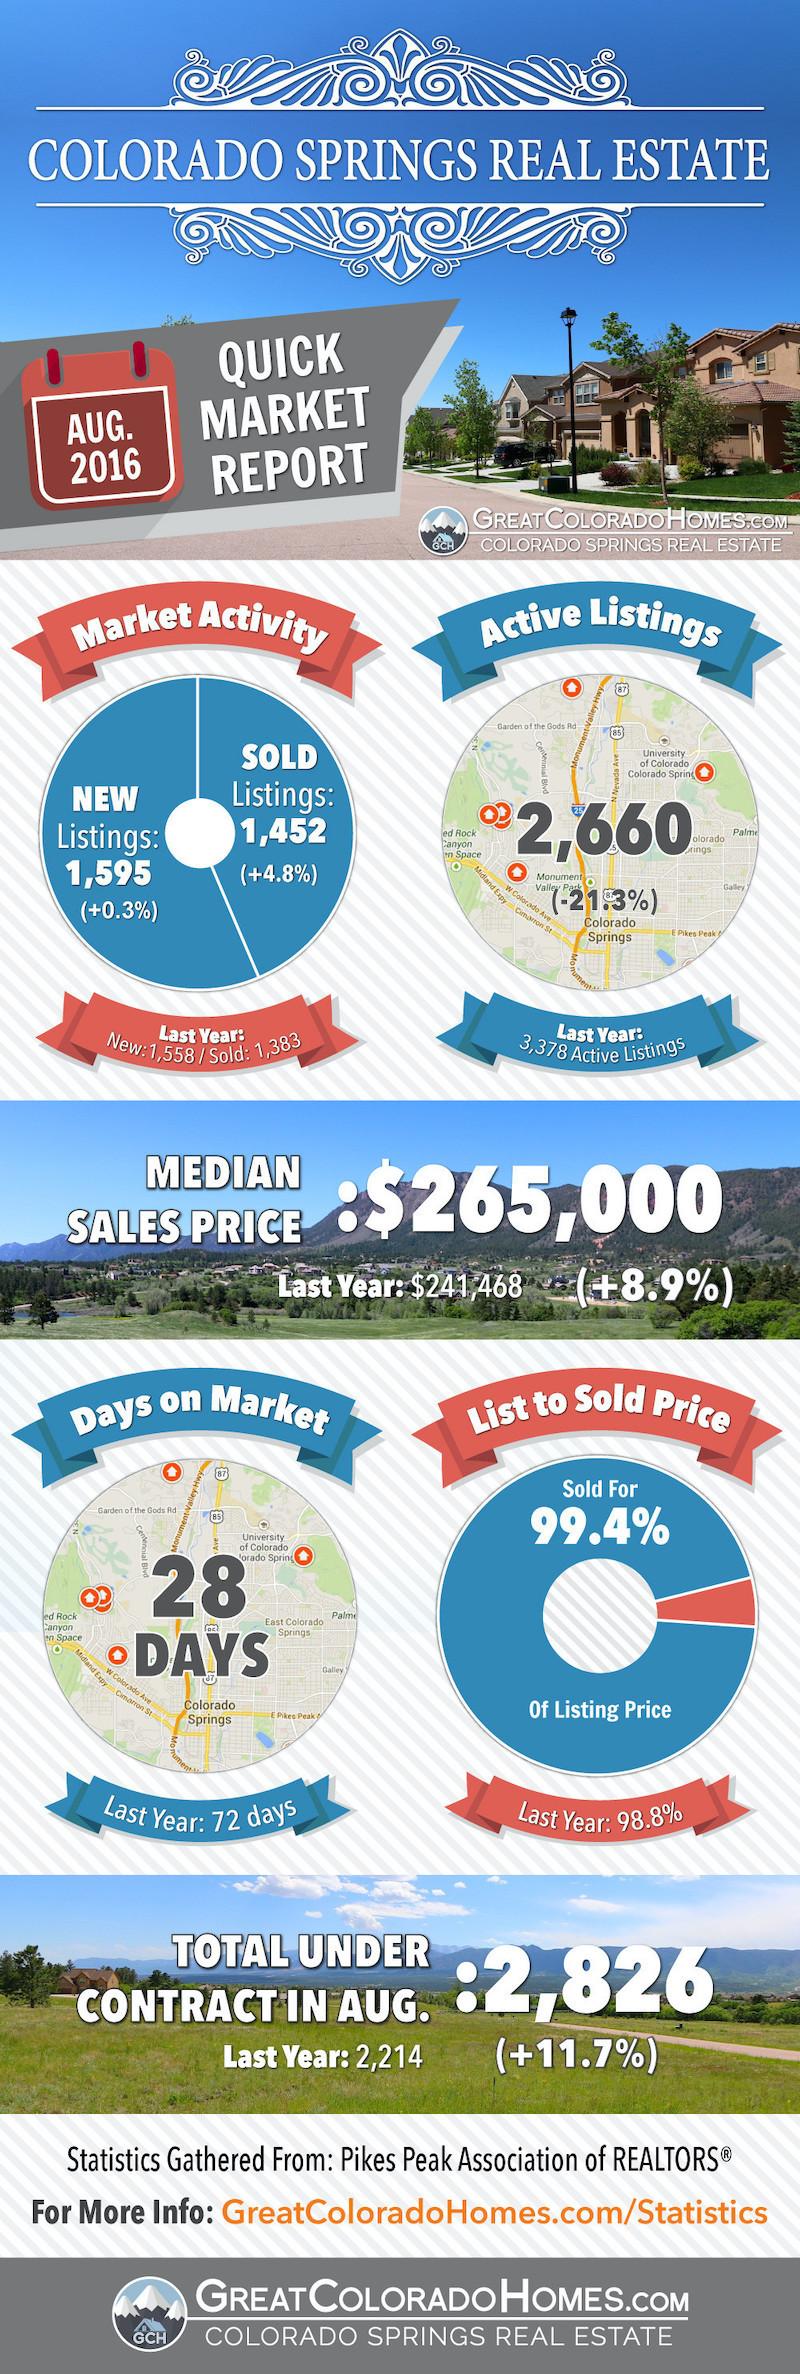 August 2016 Colorado Springs Real Estate Market Report